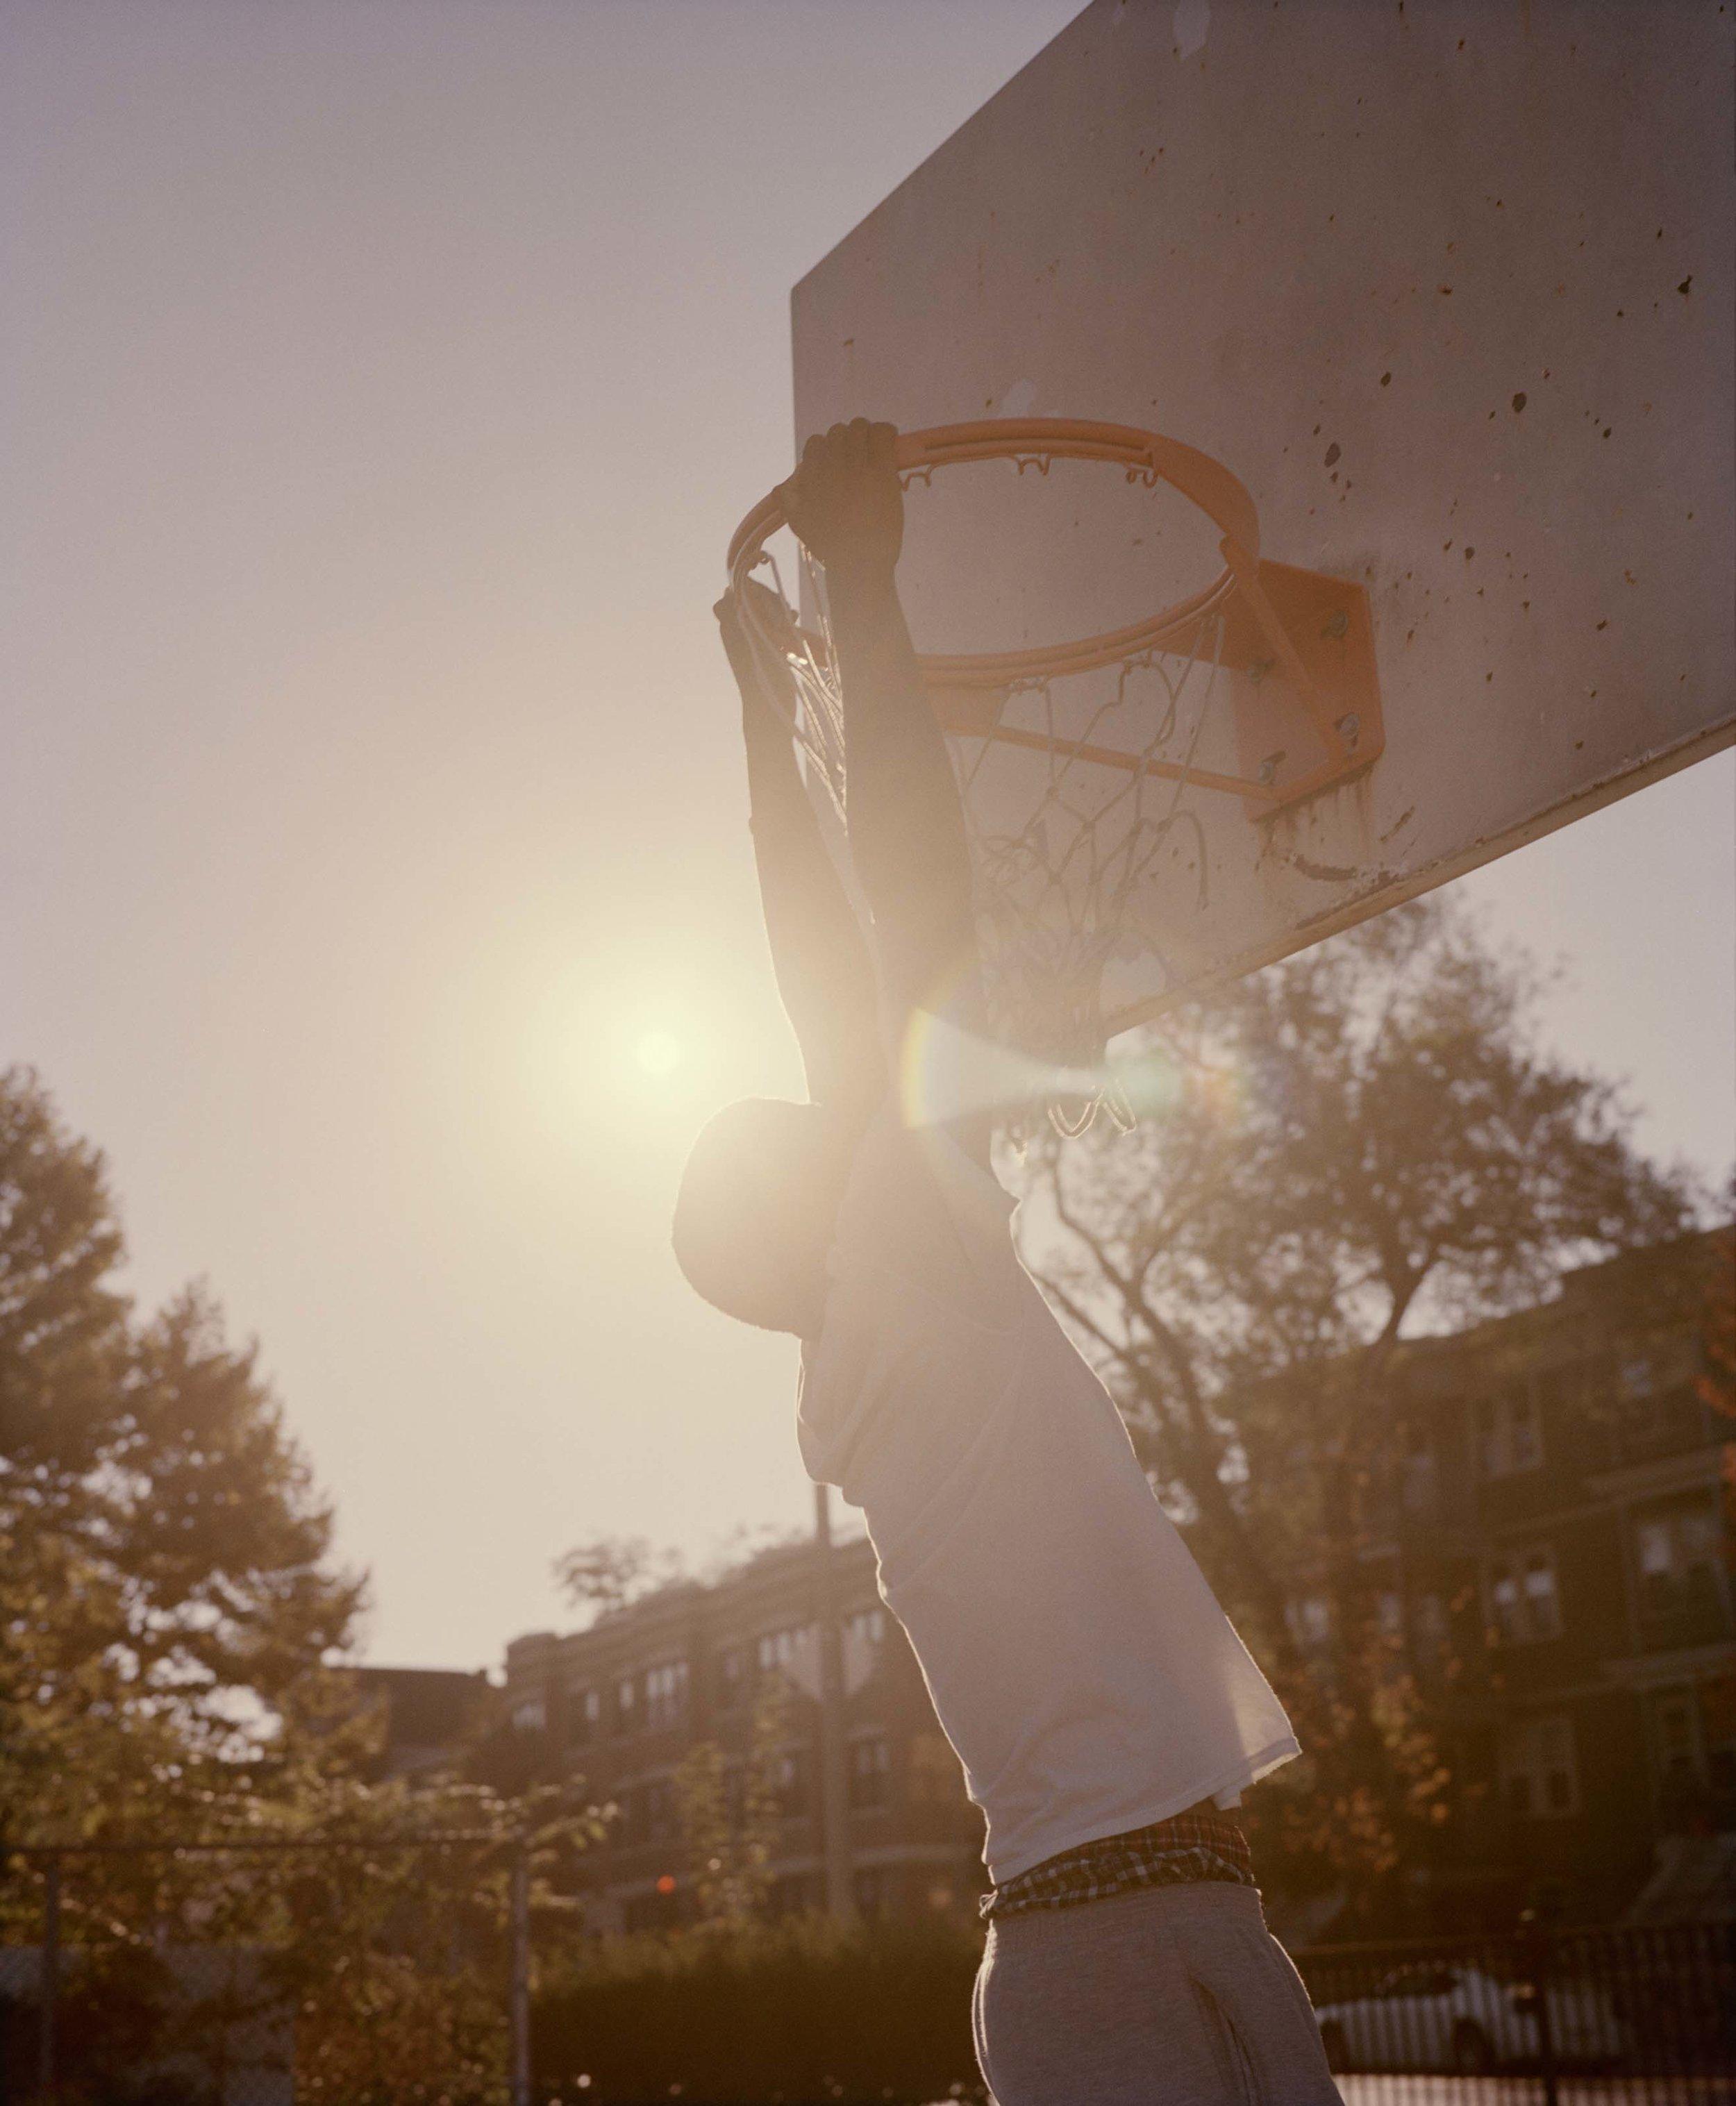 Enrique Playing Basketball, Mattapan, MA, 2014